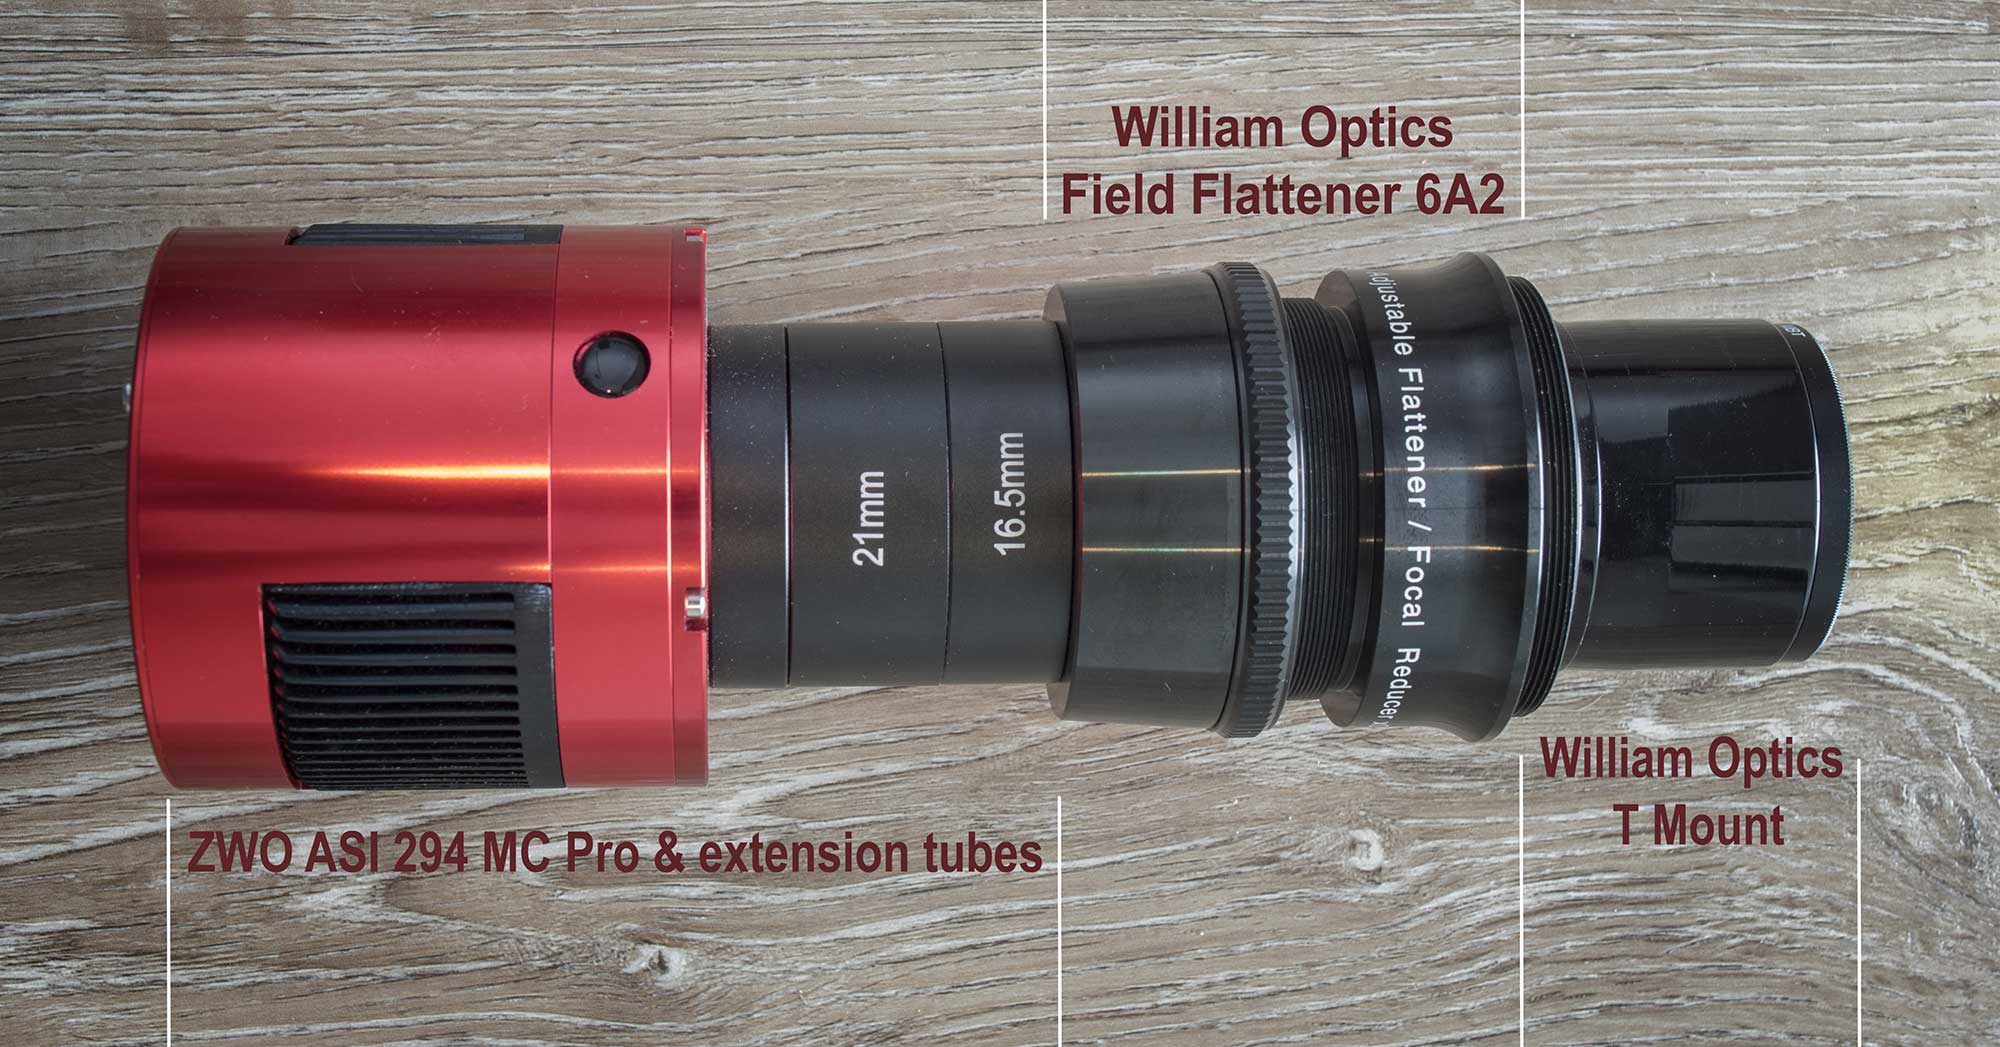 Optical train - William Optics GT71 with 6A2 field flattener